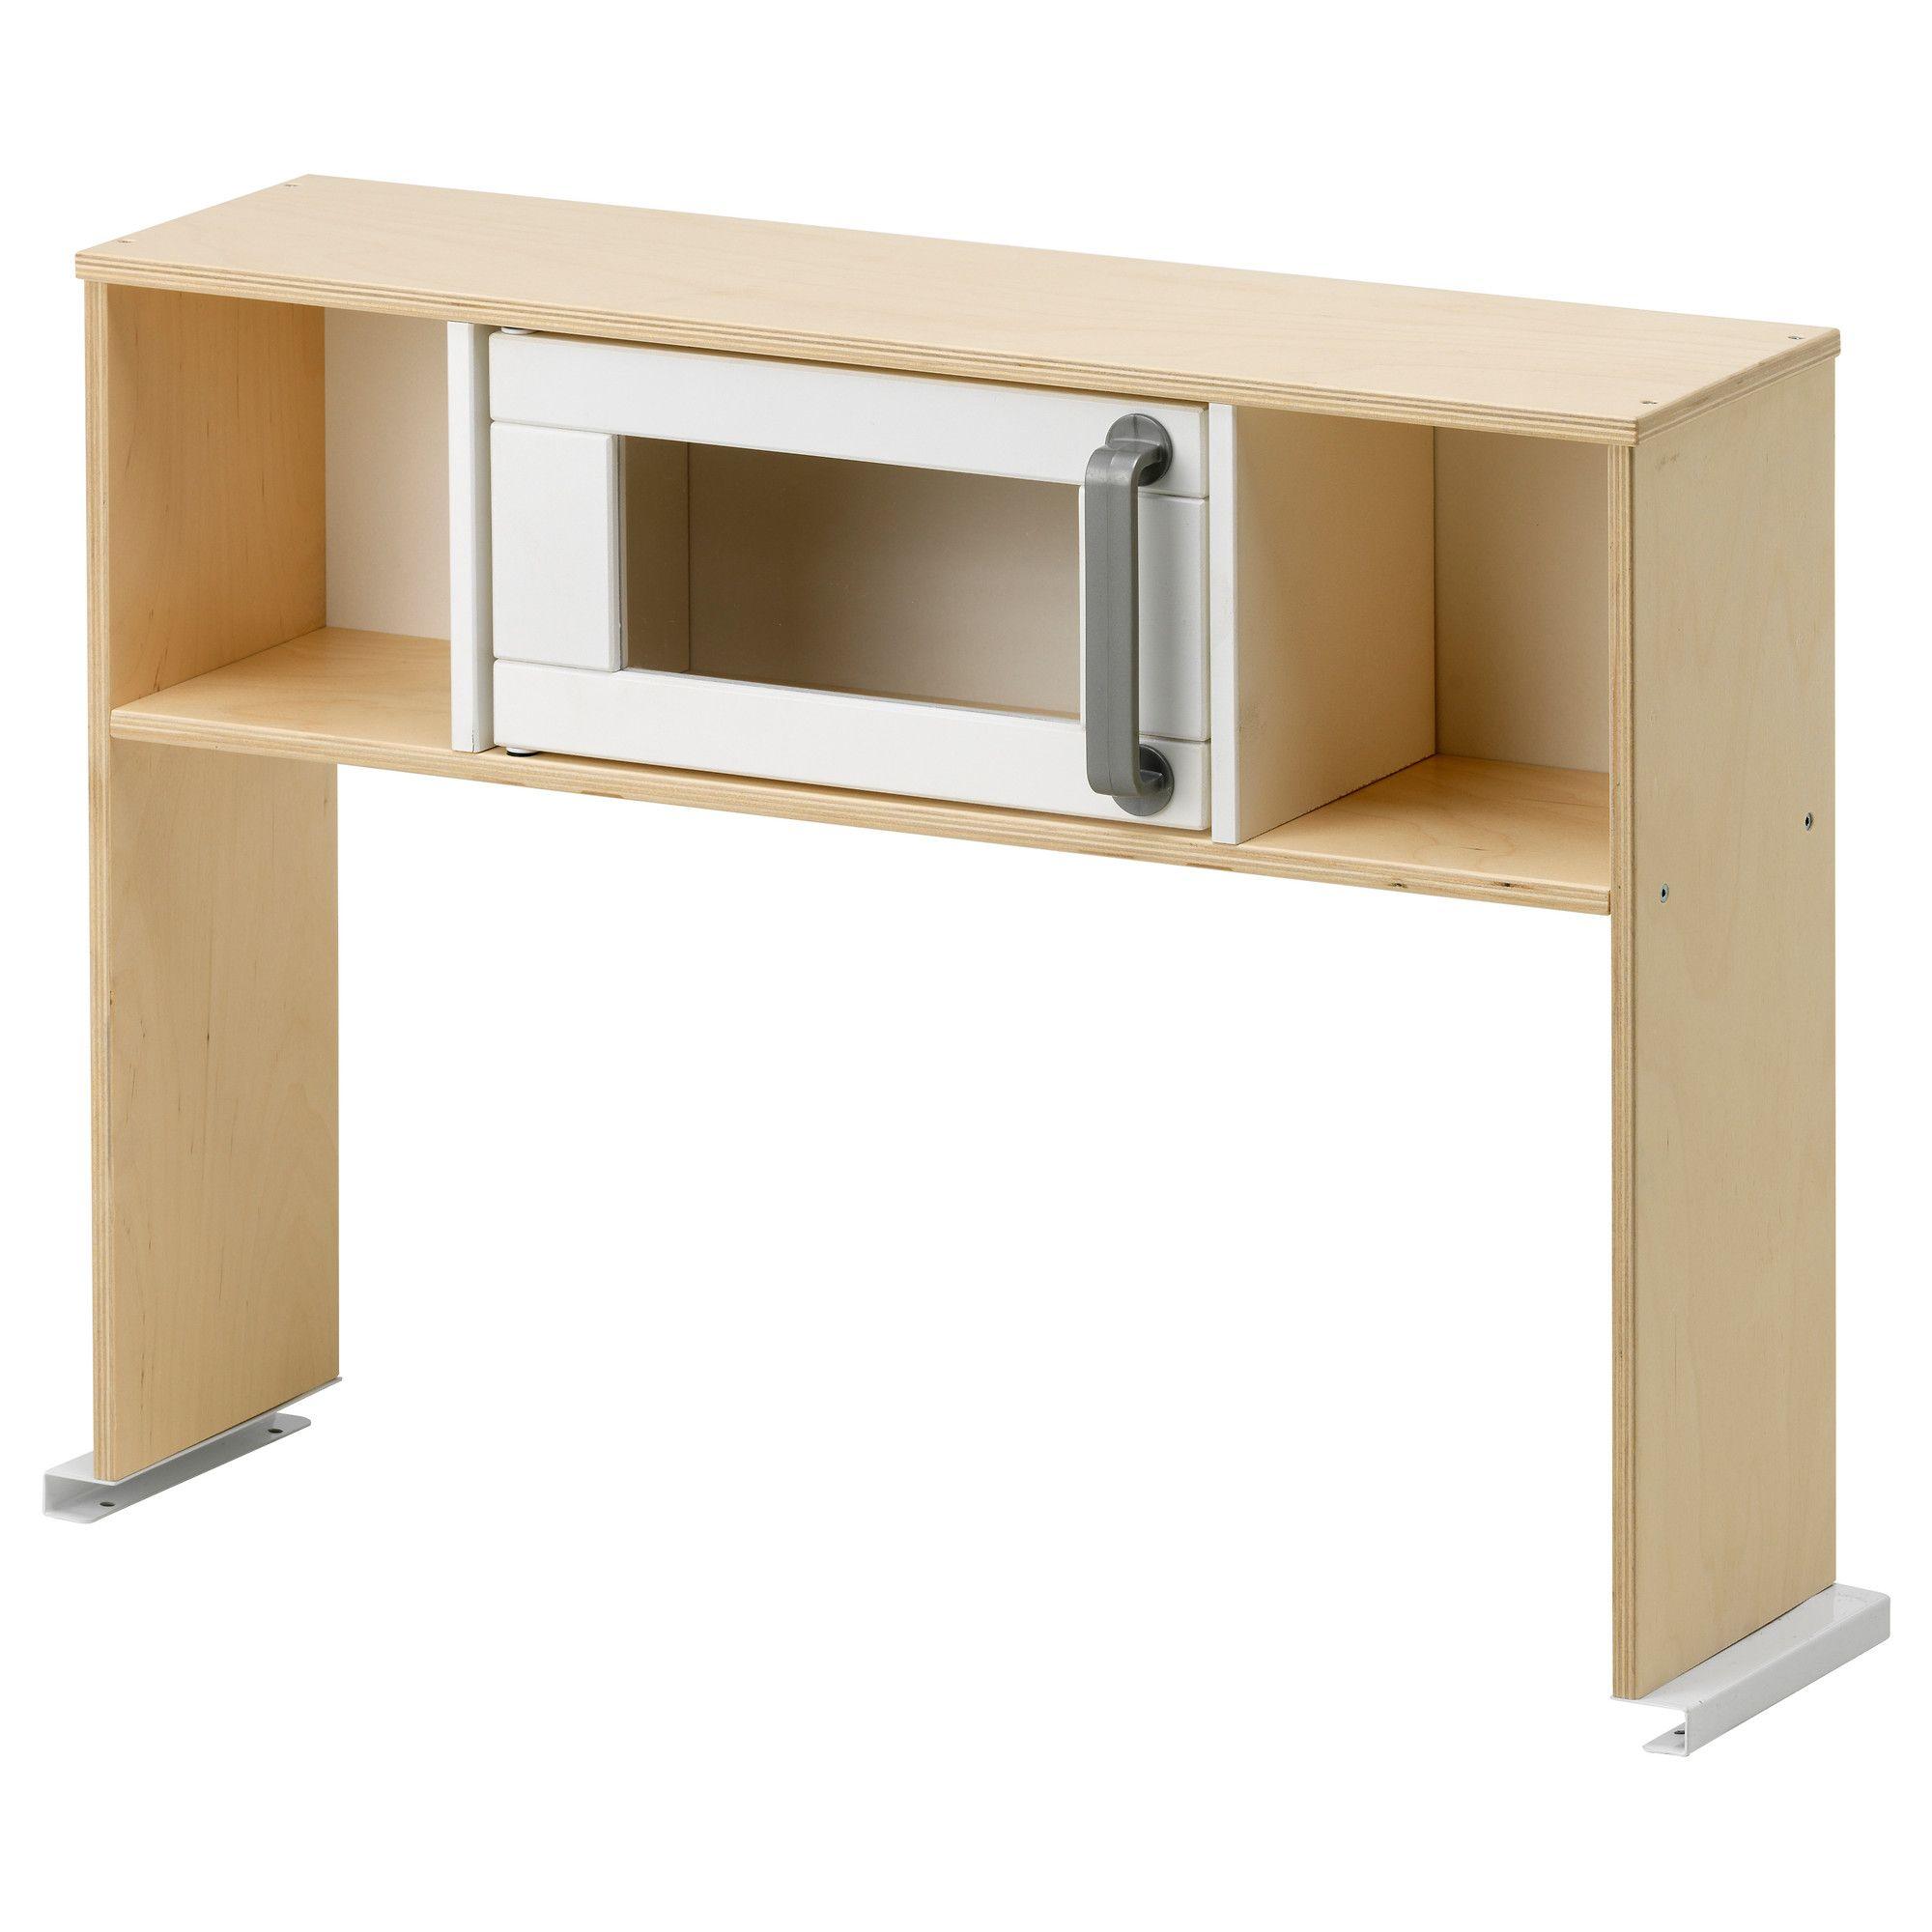 US - Furniture and Home Furnishings | Ikea play kitchen ...